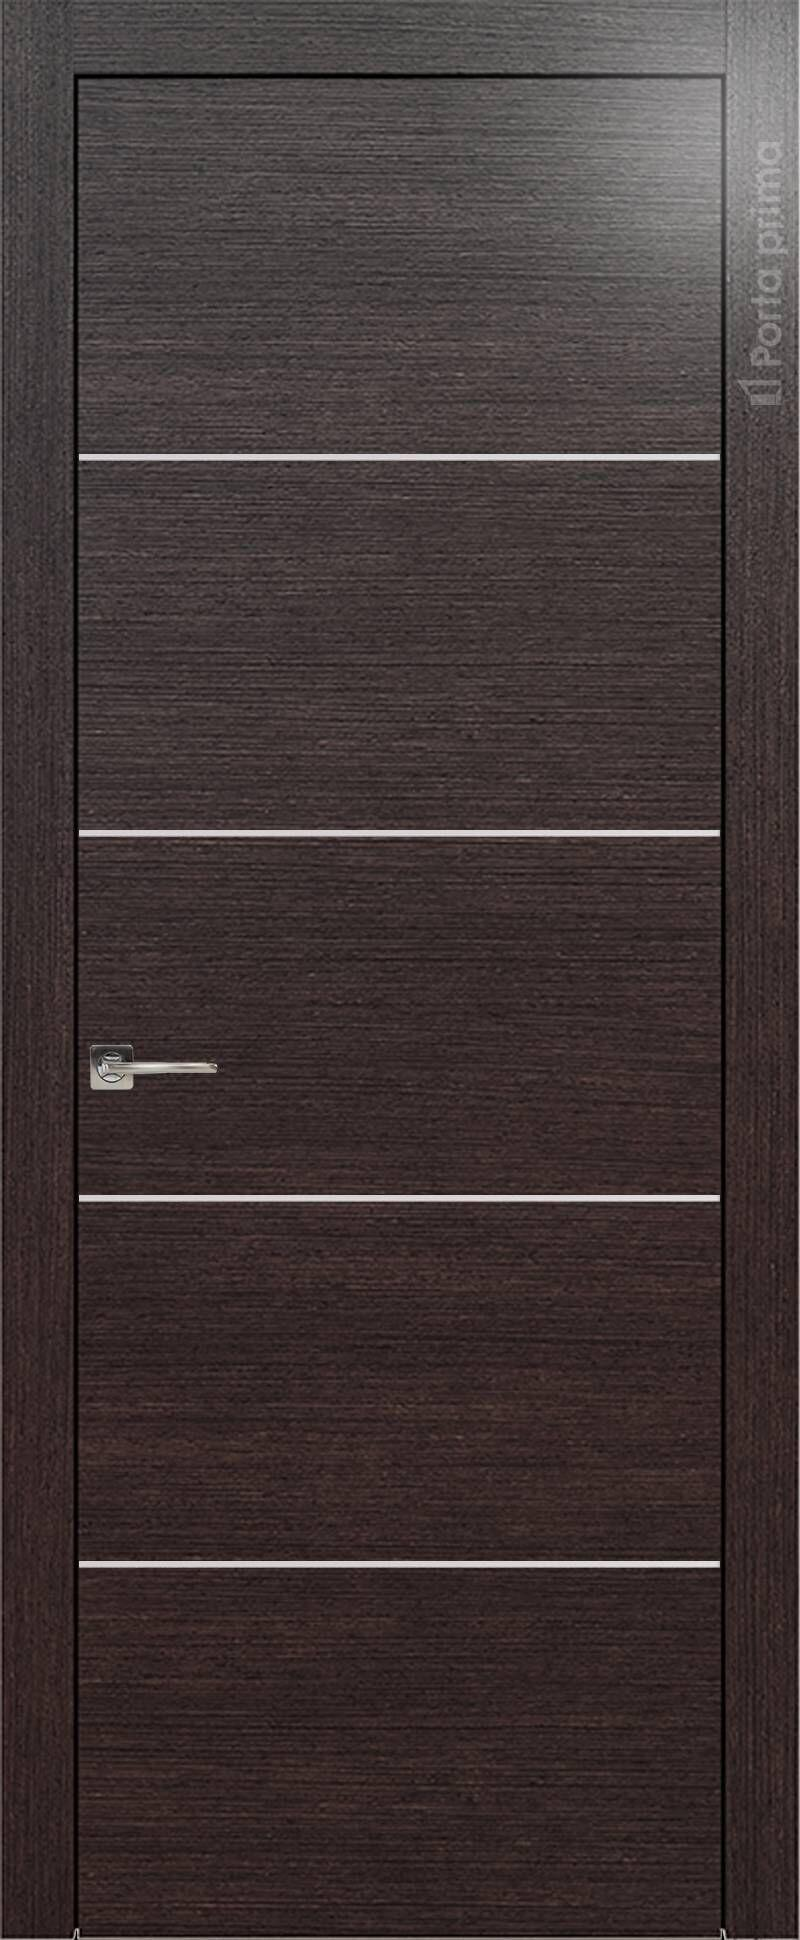 Tivoli Д-3 цвет - Венге Шоколад Без стекла (ДГ)